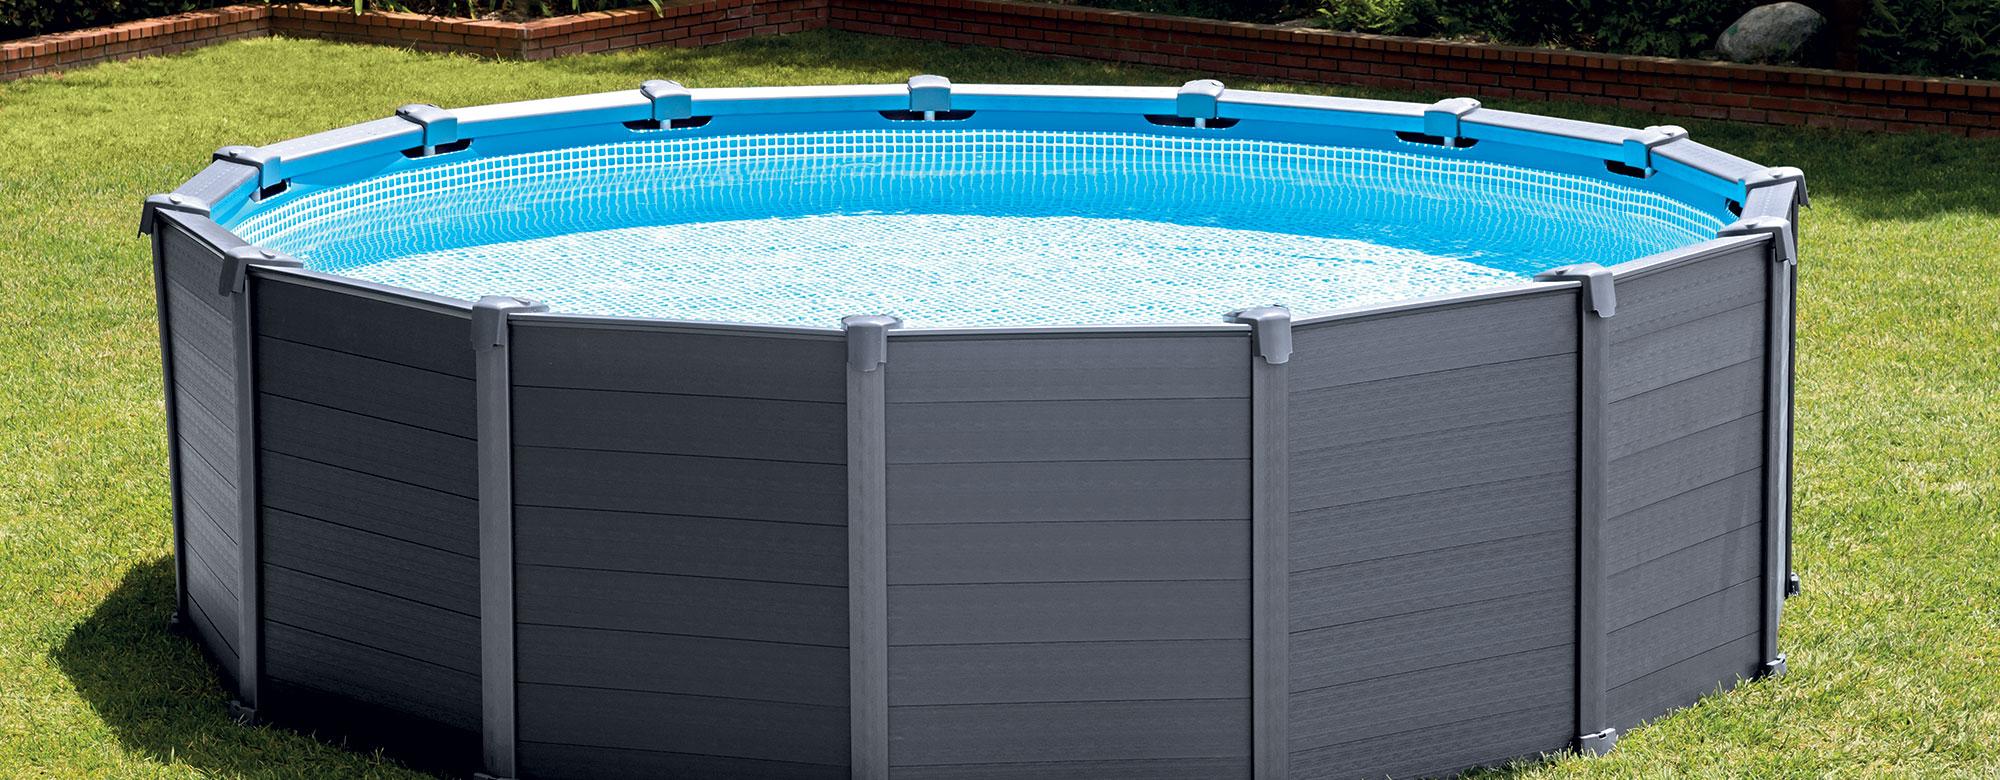 Installer ma piscine Graphite Intex